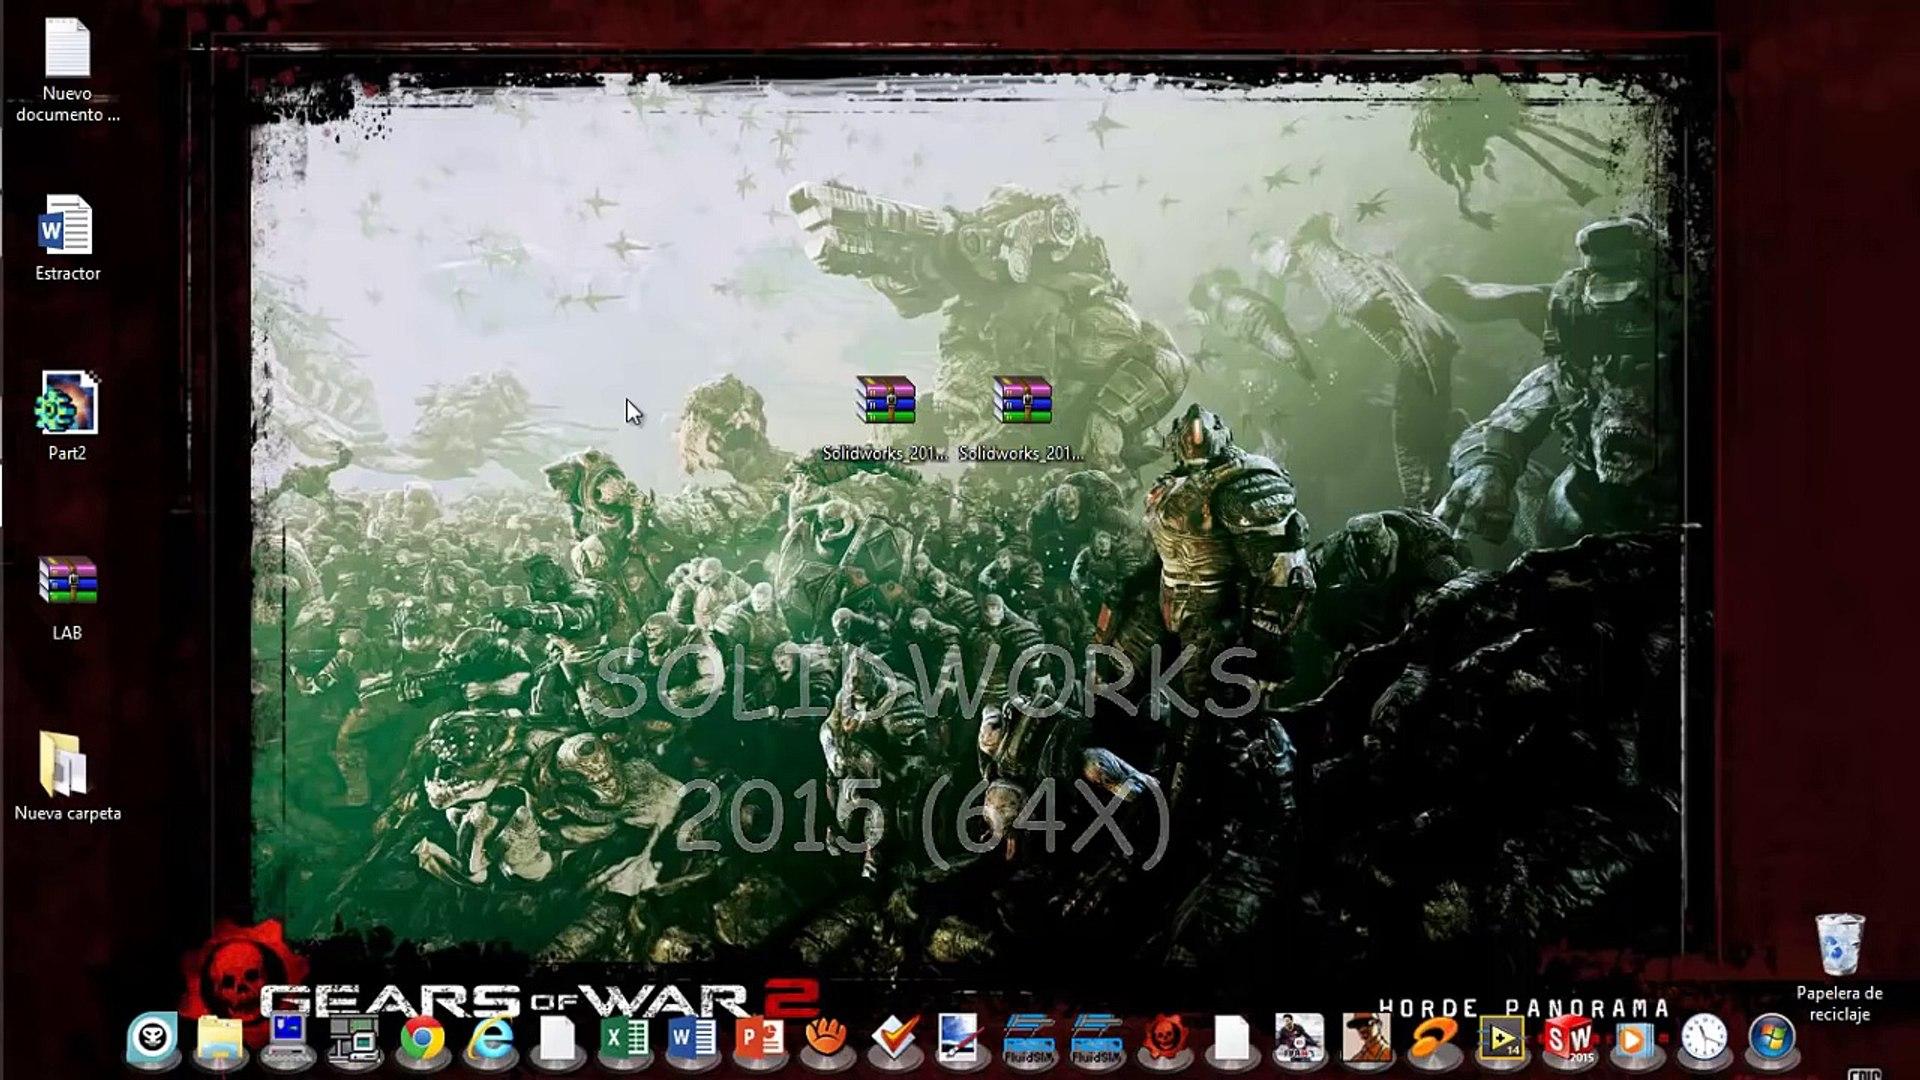 download solidworks 2013 64 bits crackeado torrent